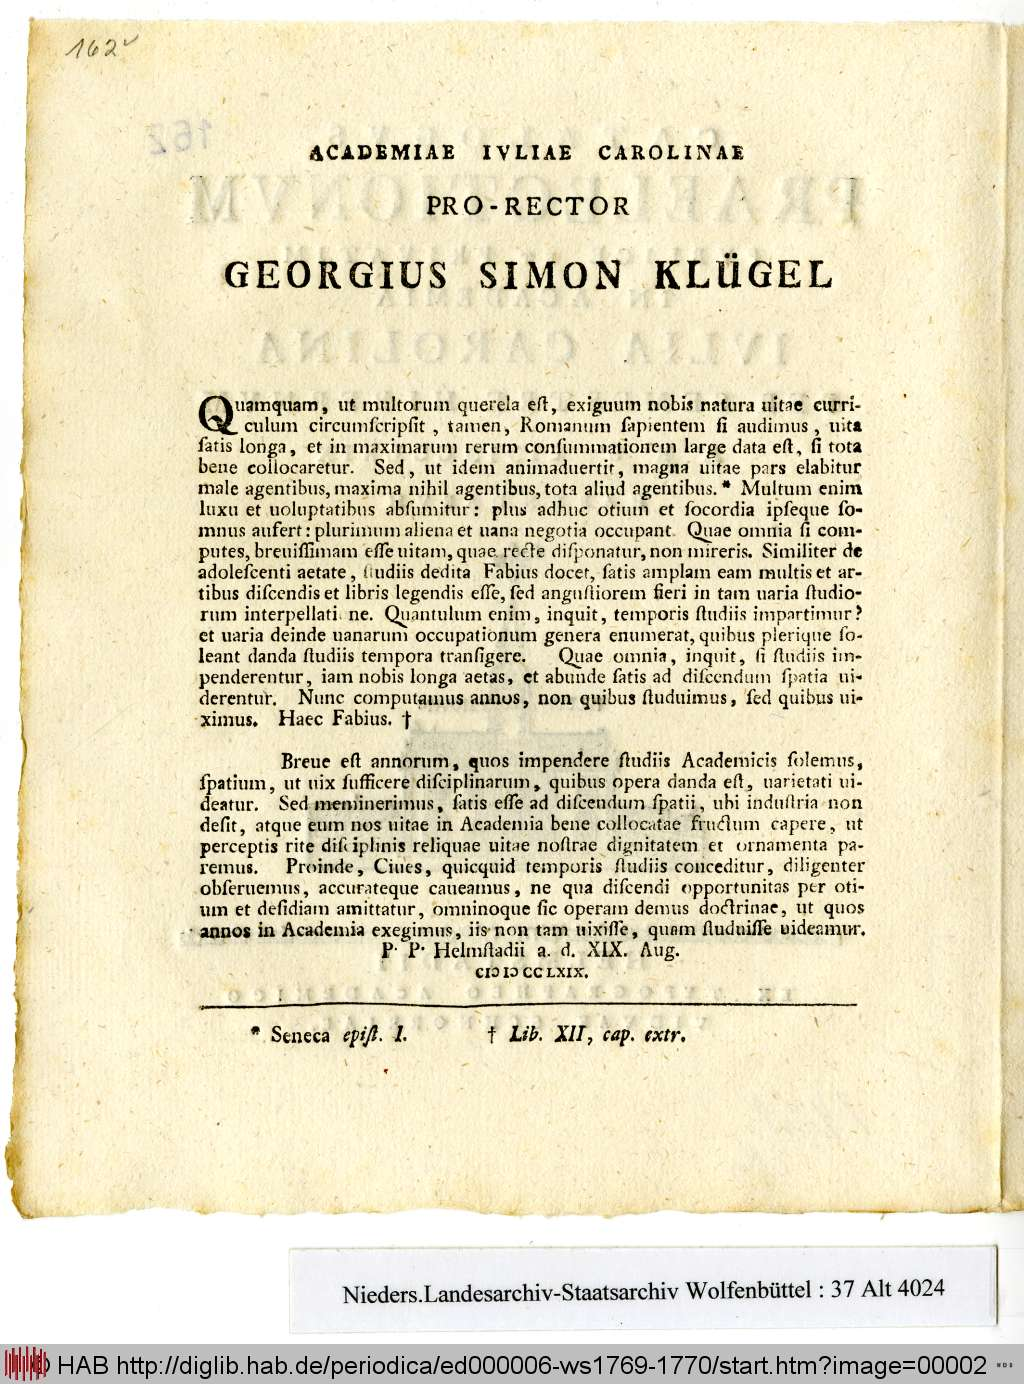 http://diglib.hab.de/periodica/ed000006-ws1769-1770/00002.jpg